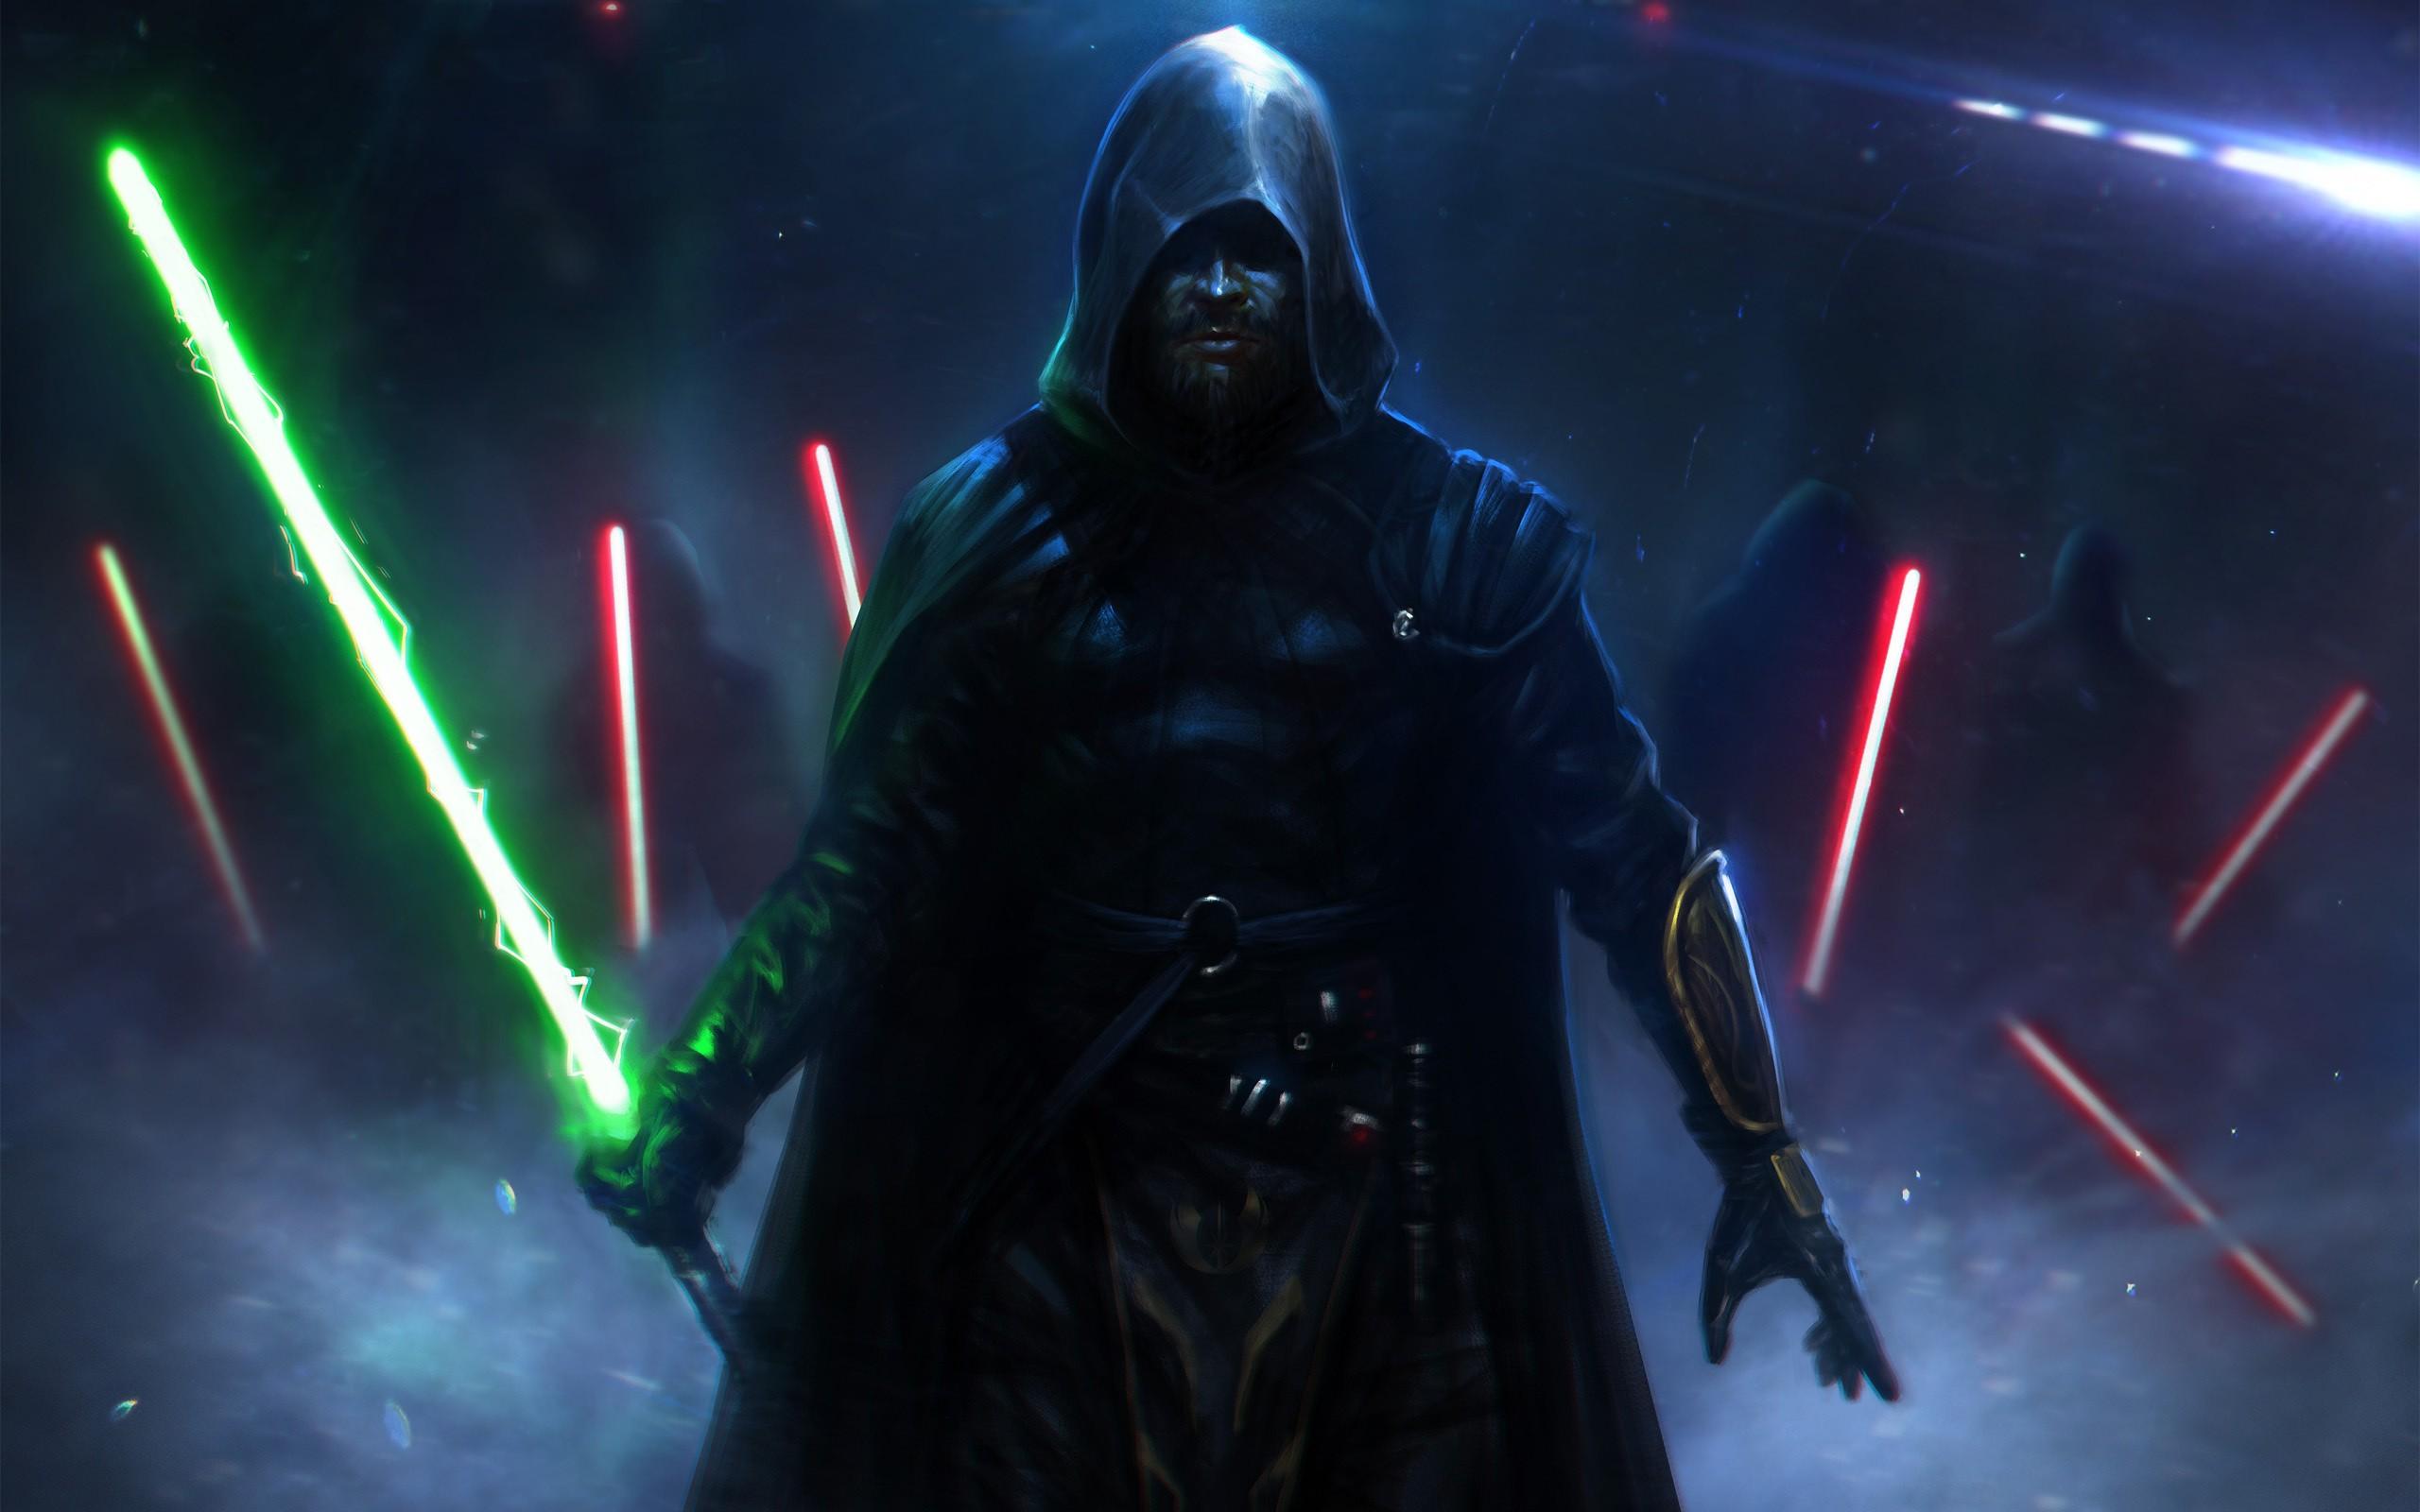 Star-Wars-Dark-Lightsabers-Sith-Jedi-Evil-Force-Wide